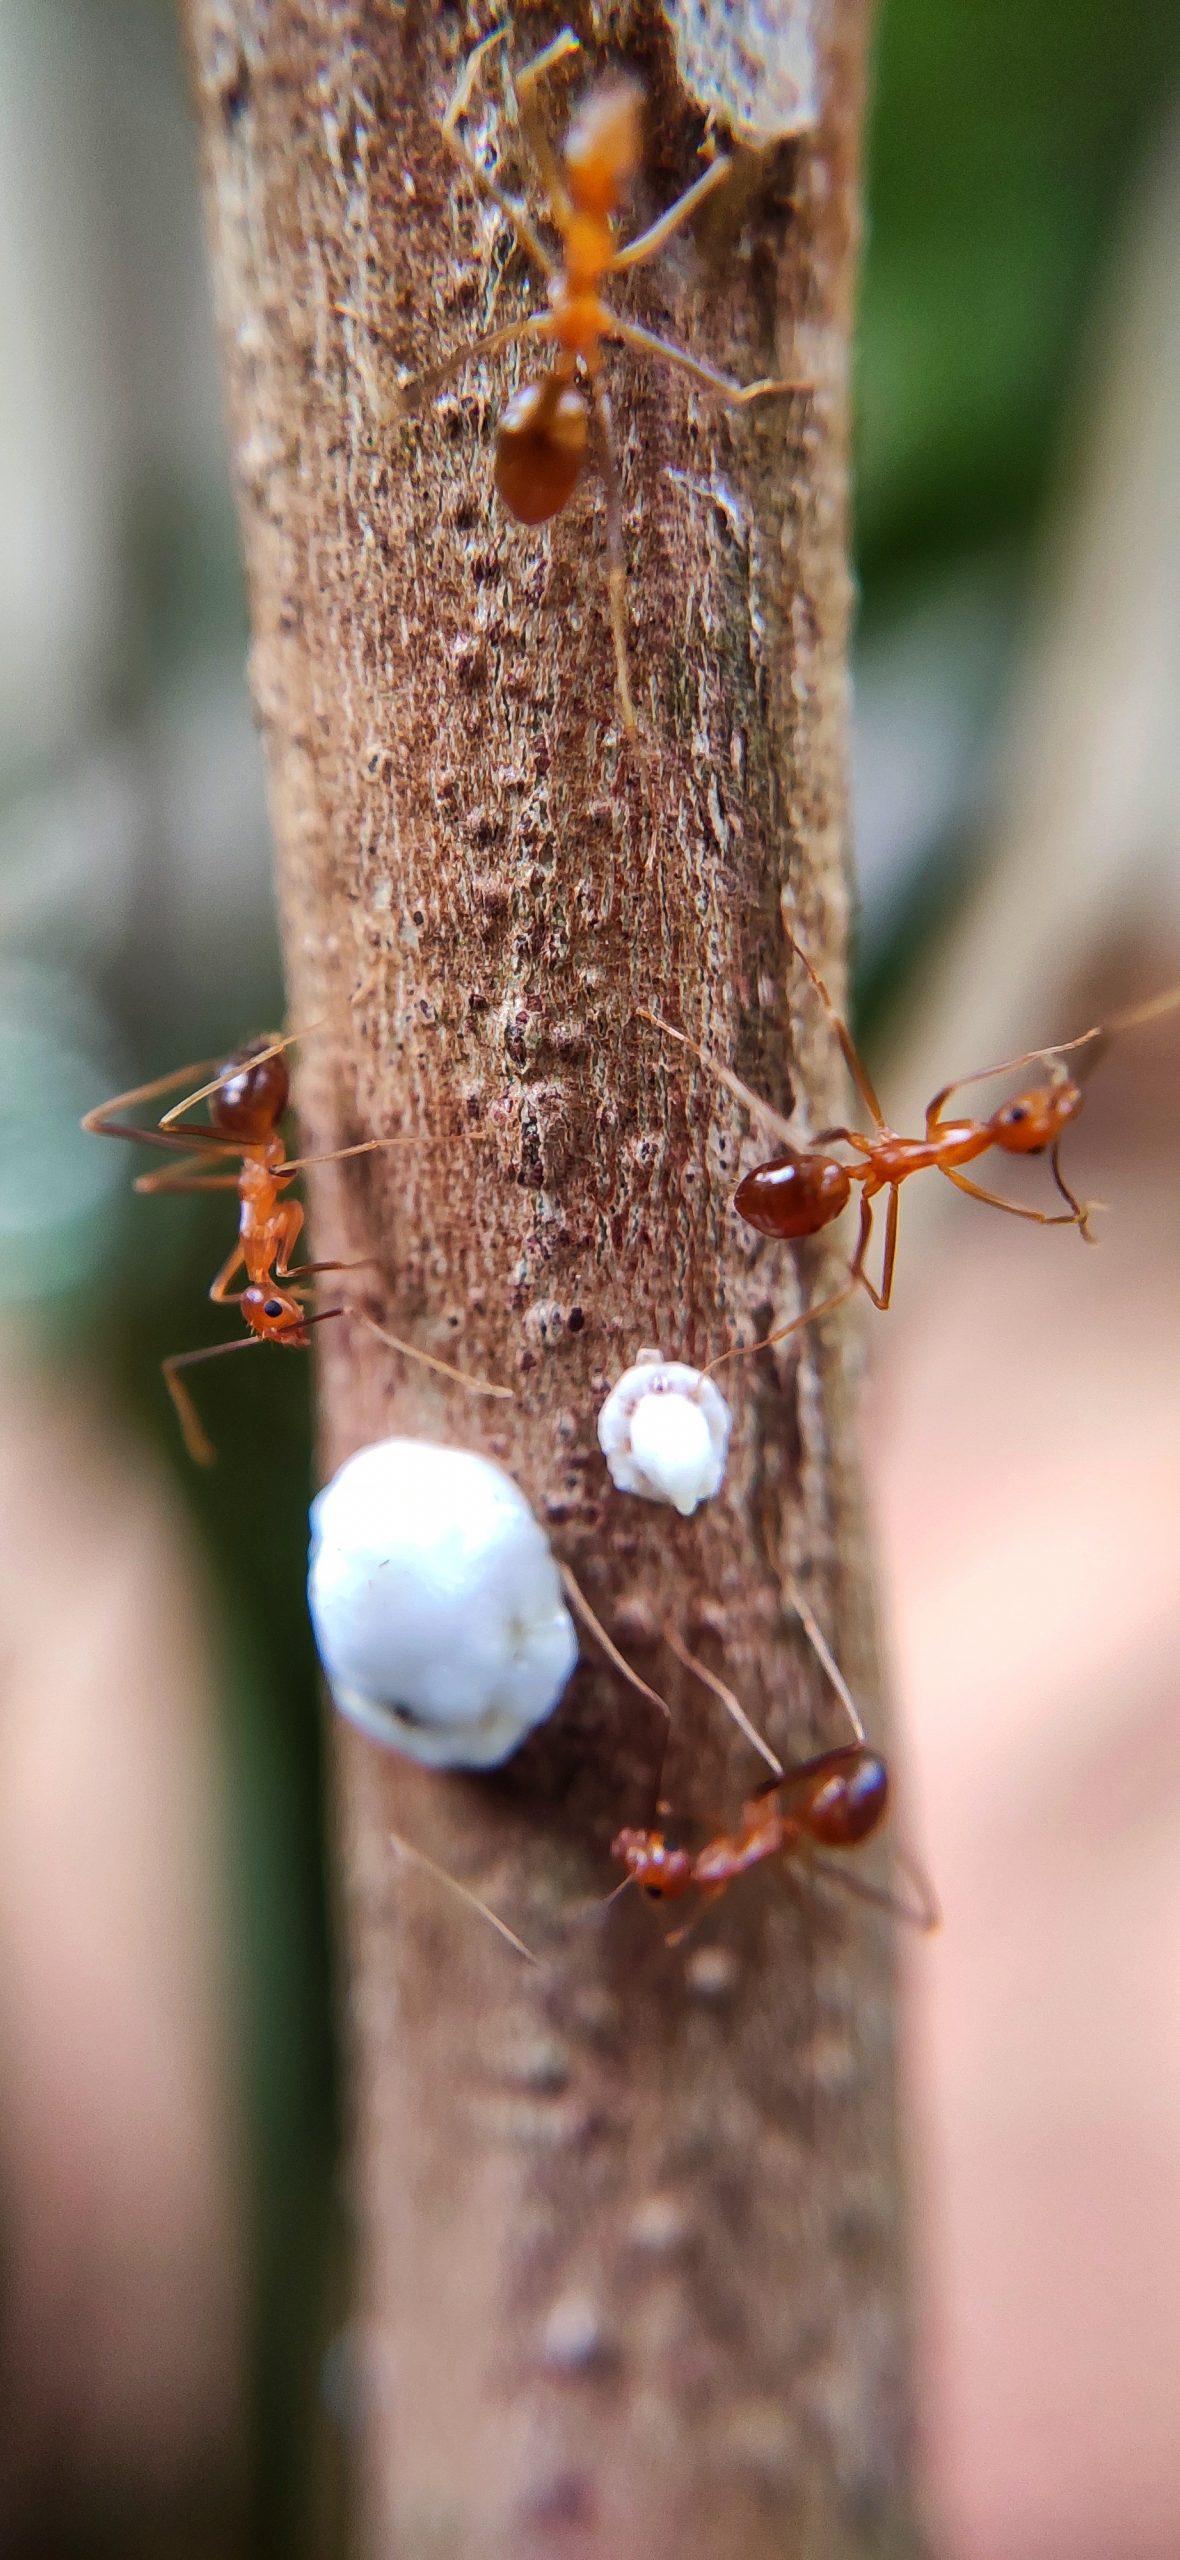 Ants on a tree stem